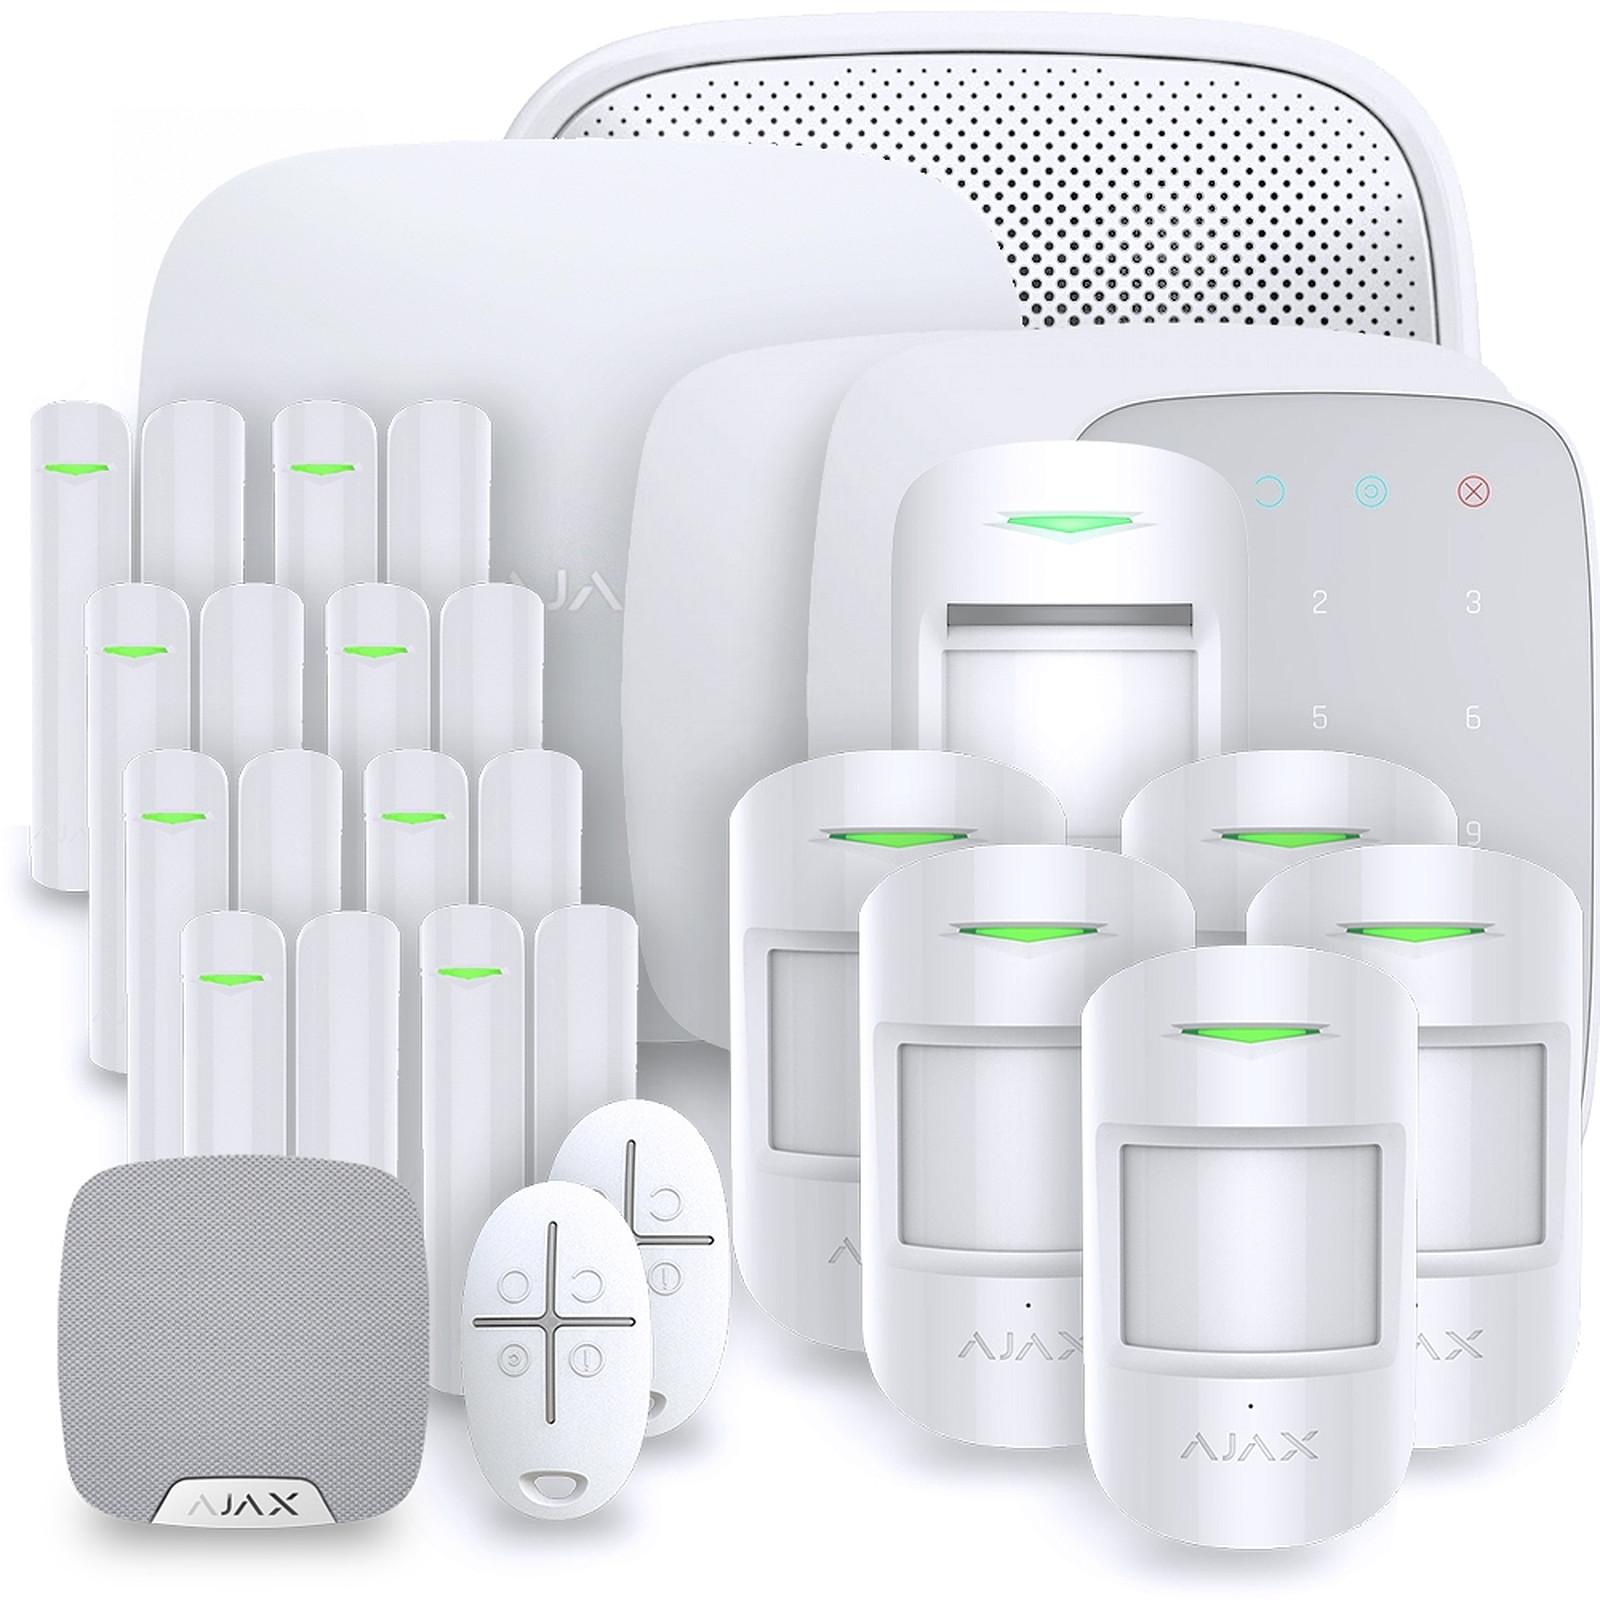 Ajax Alarme maison StarterKit blanc  Kit 13